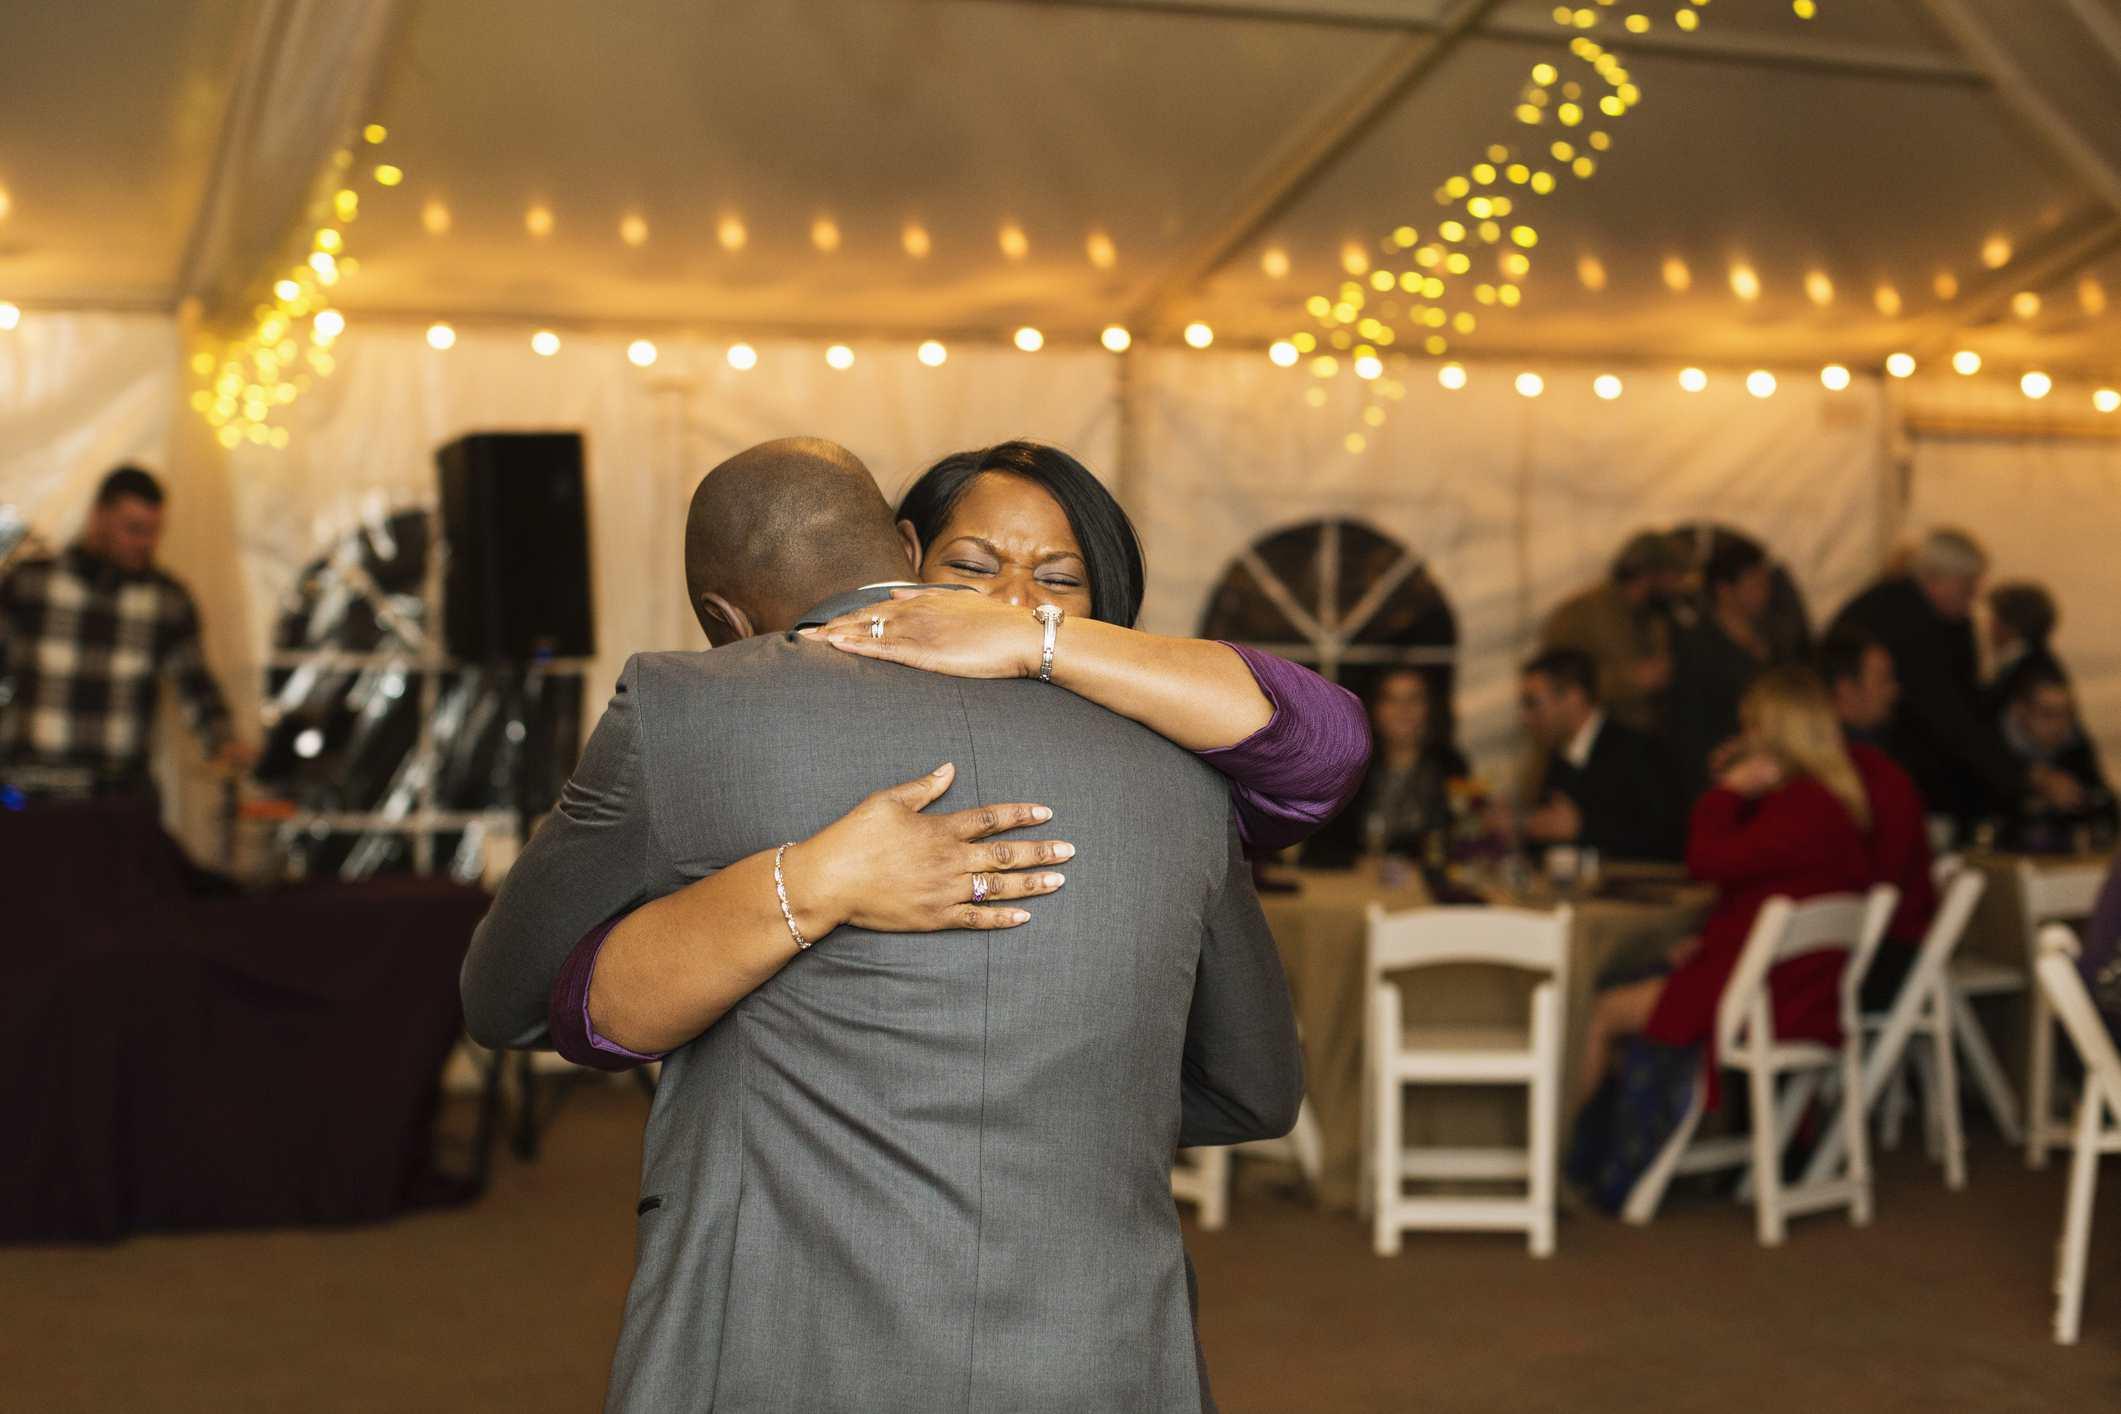 Como homenagear as maes dos noivos no casamento 3